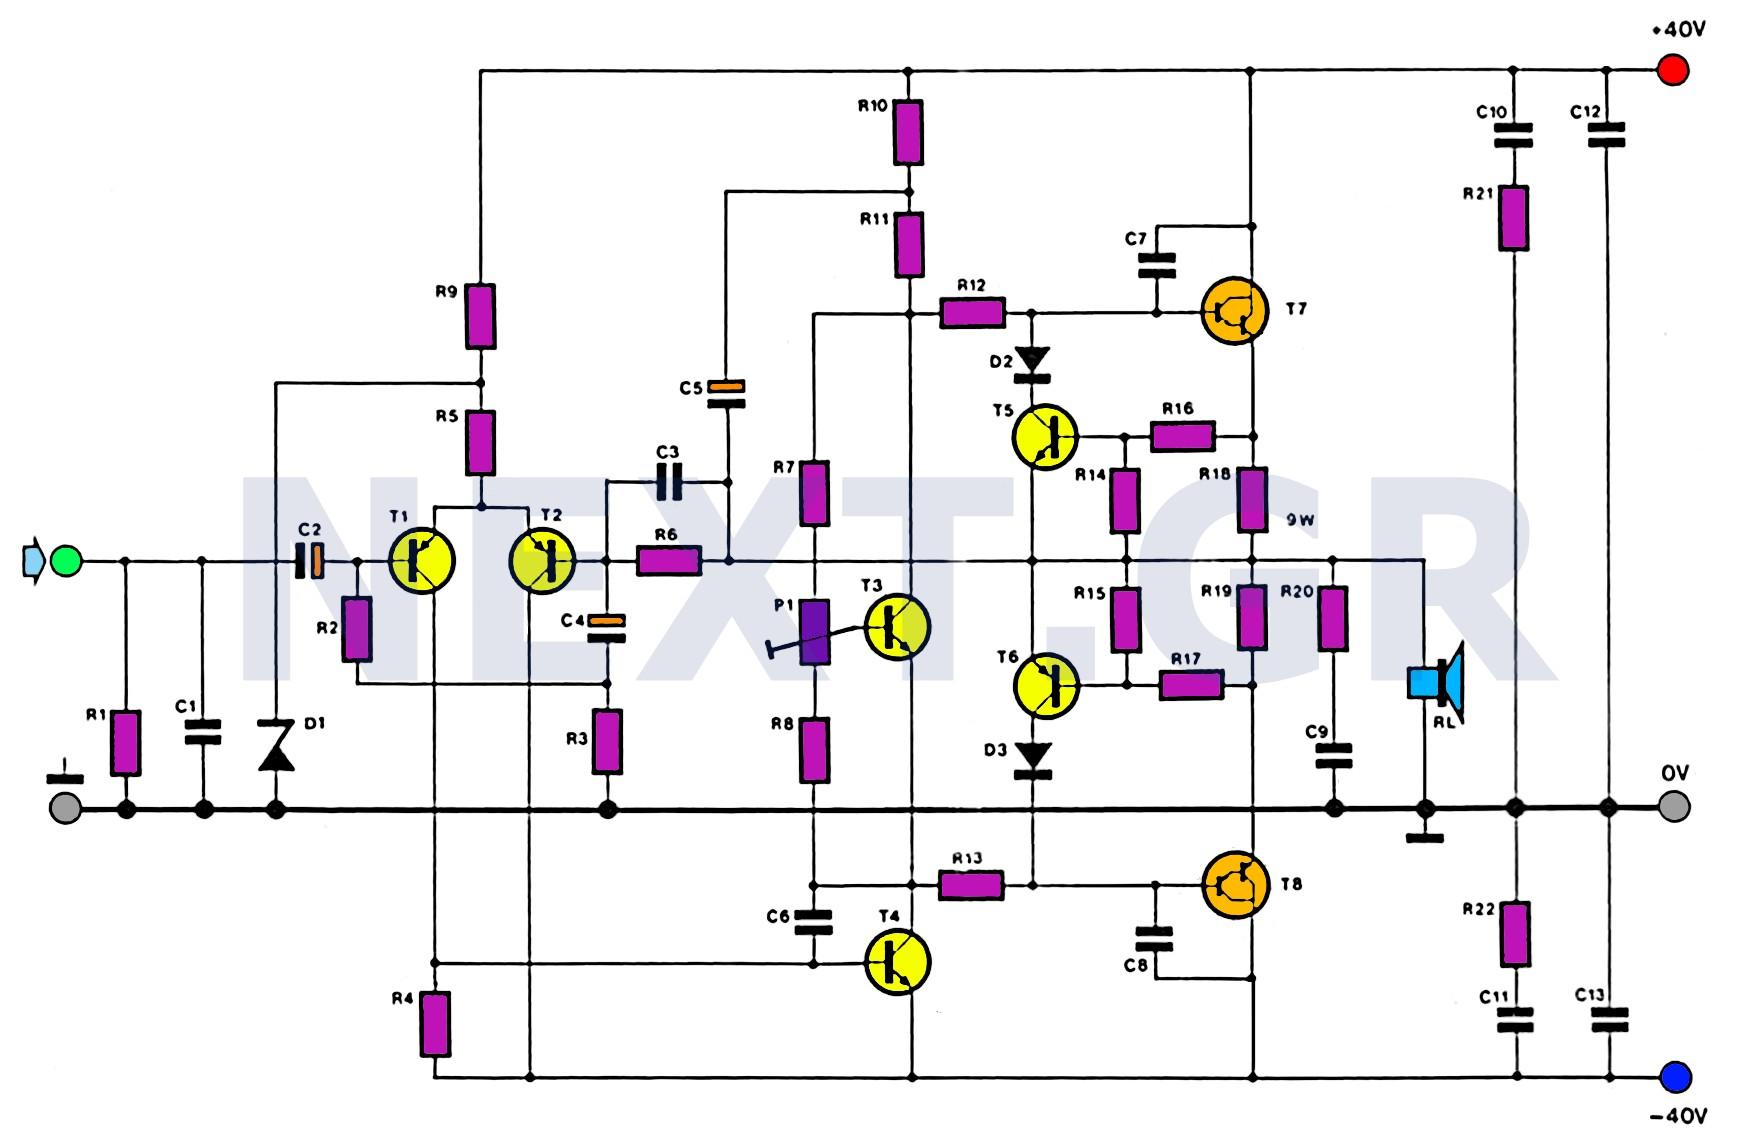 Tda 2040 25w Audio Amp Schematic Ev 7063] Hifi Audio Amplifier Circuit Based Tda2050 Audio Of Tda 2040 25w Audio Amp Schematic